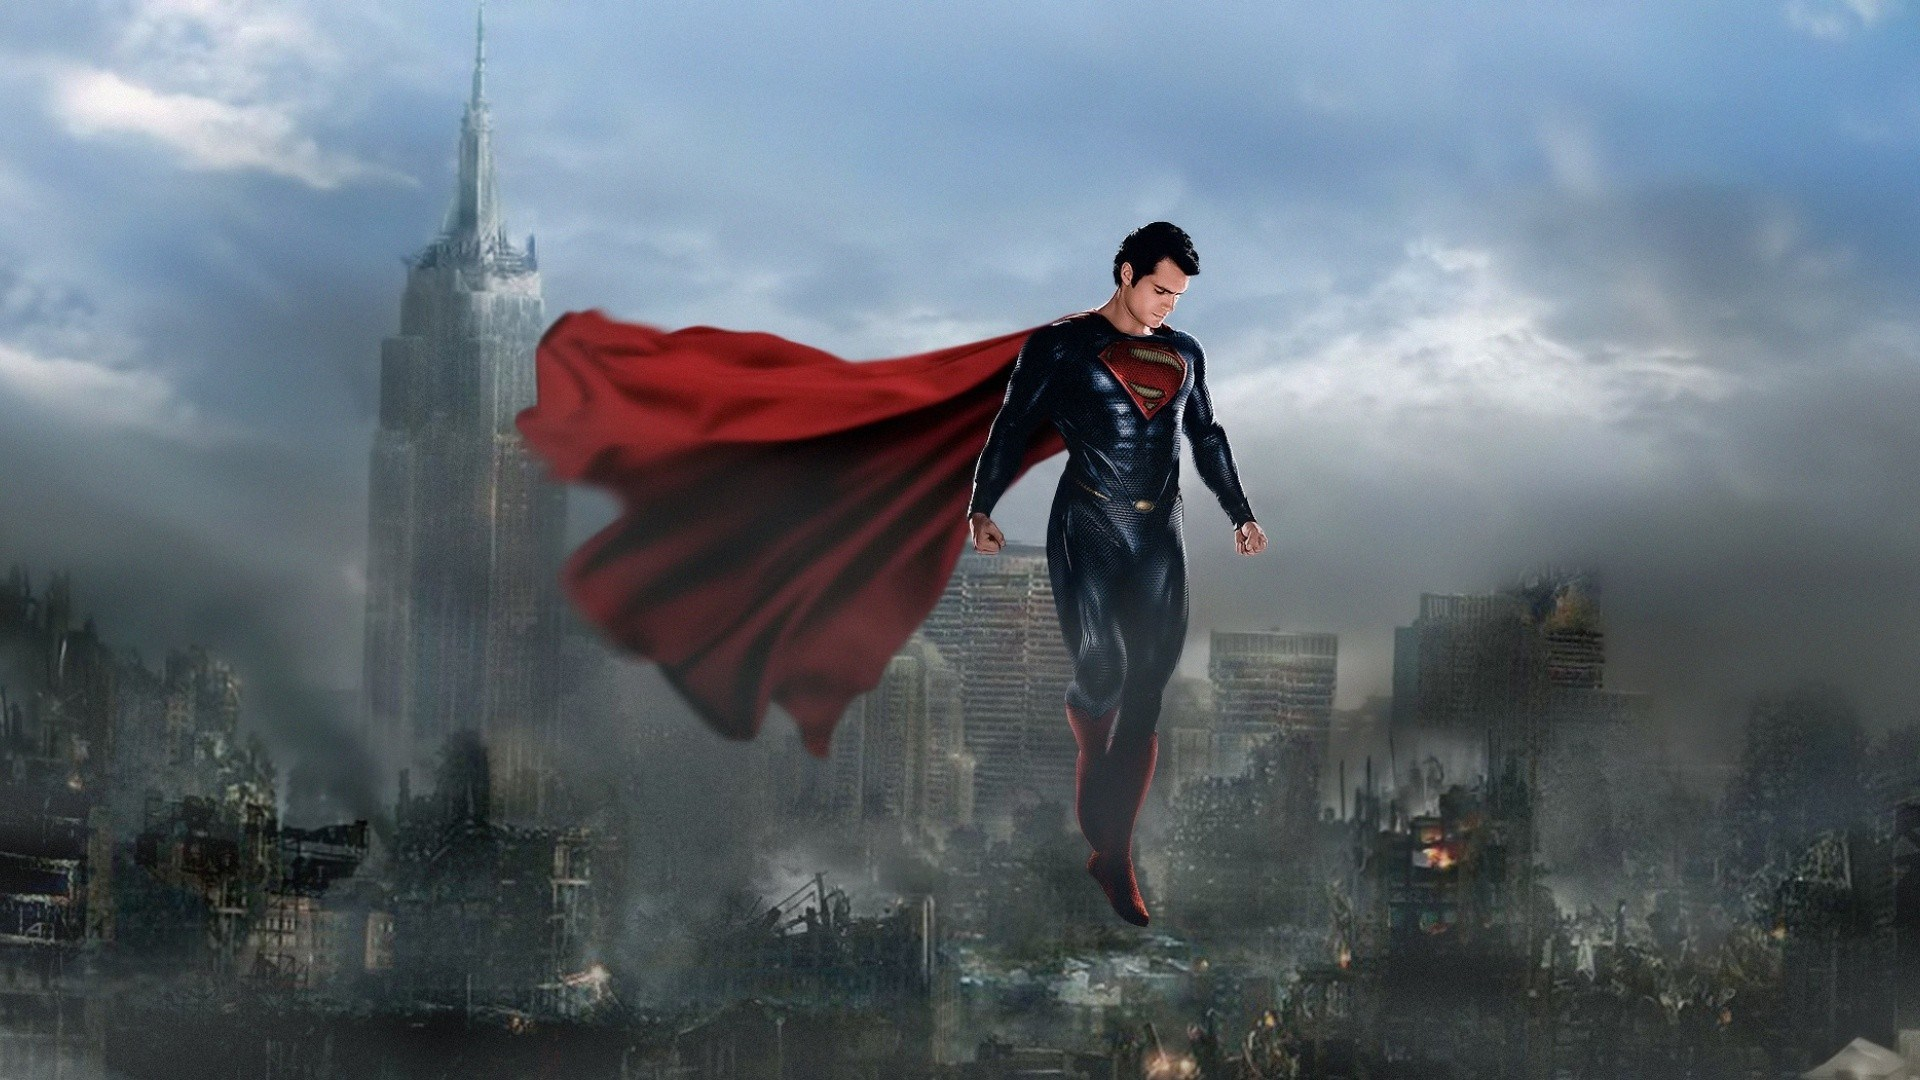 Superman Man Of Steel Wallpaper Hd 1920x1080 [50+] Free Superman Sc...